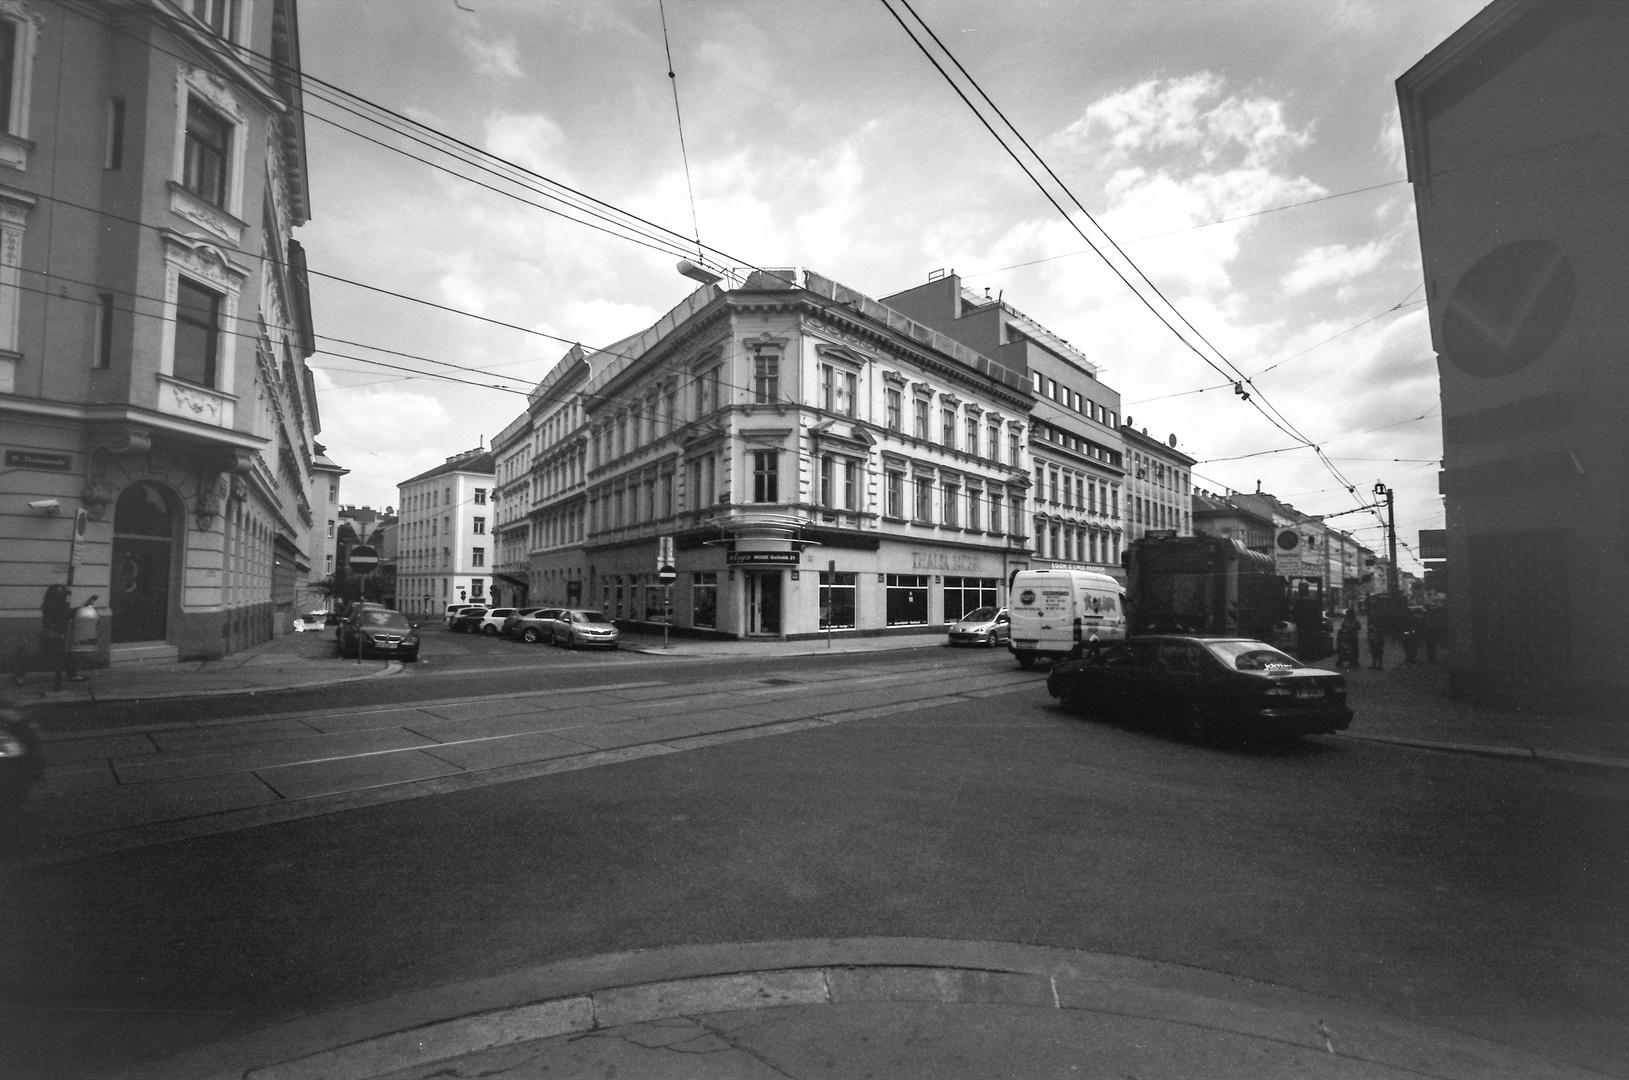 Ehemaliges Eckhaus Thaliastraße